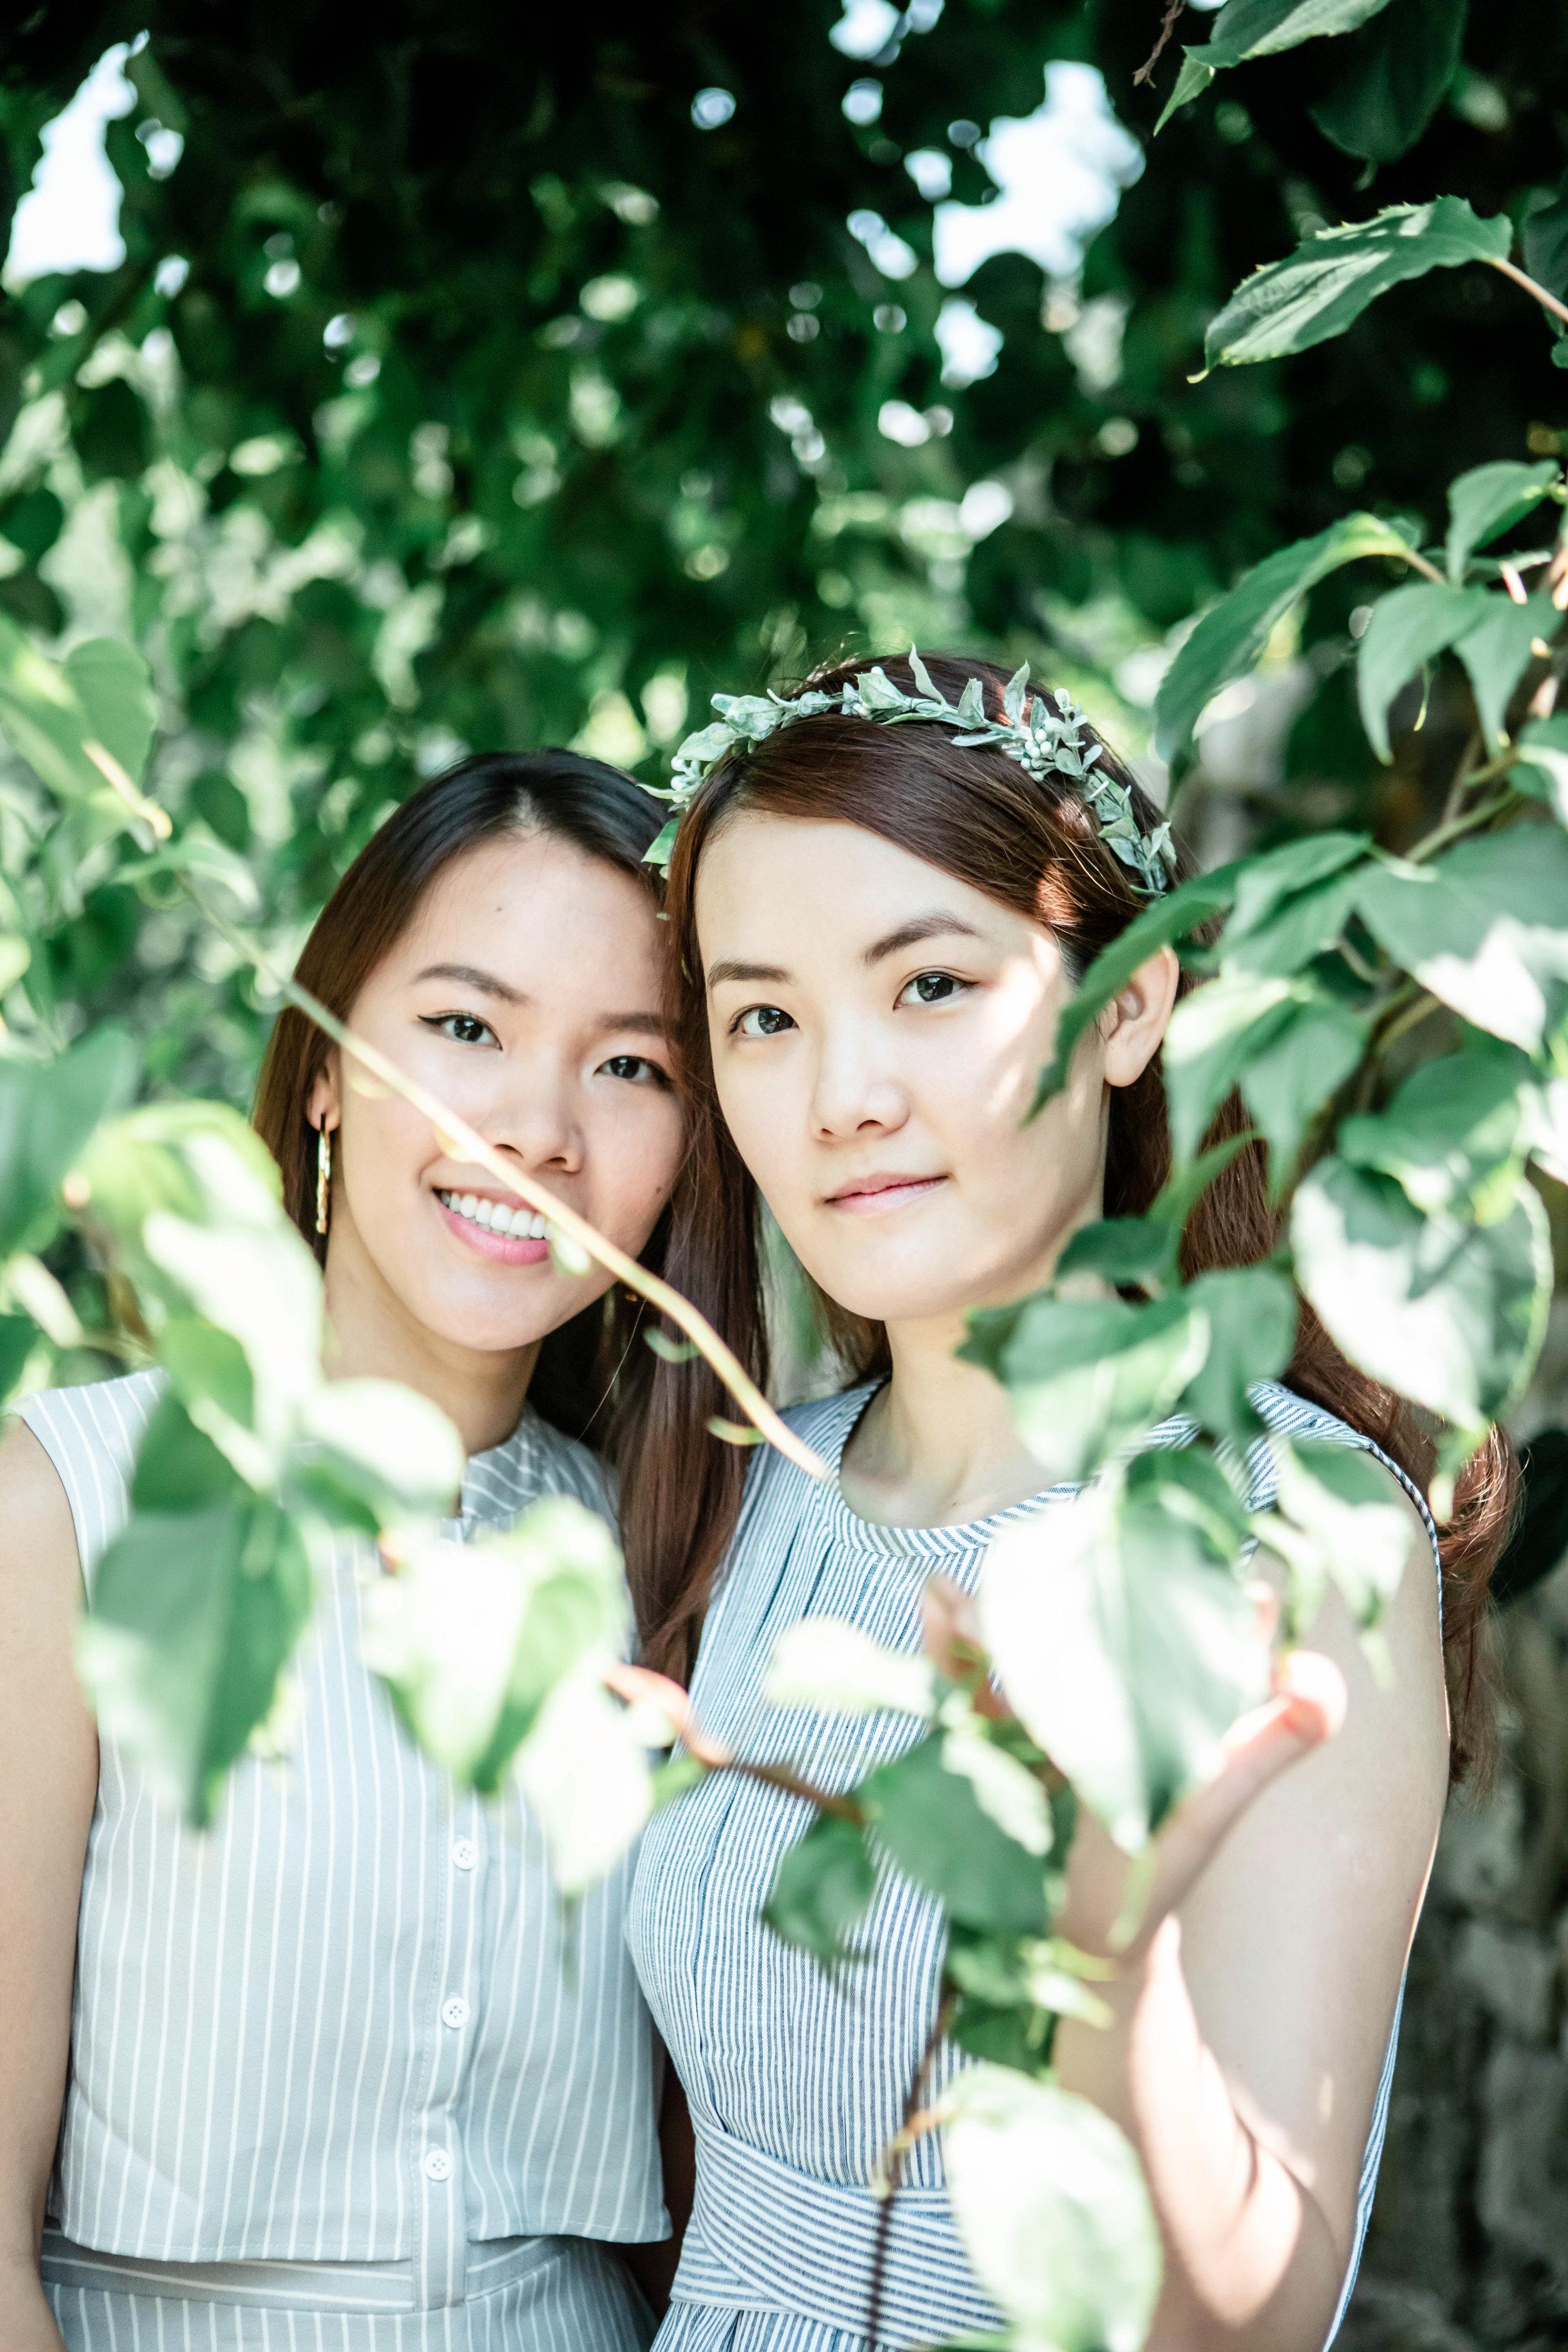 sisters-in-summertime-eva-loh-02.jpg